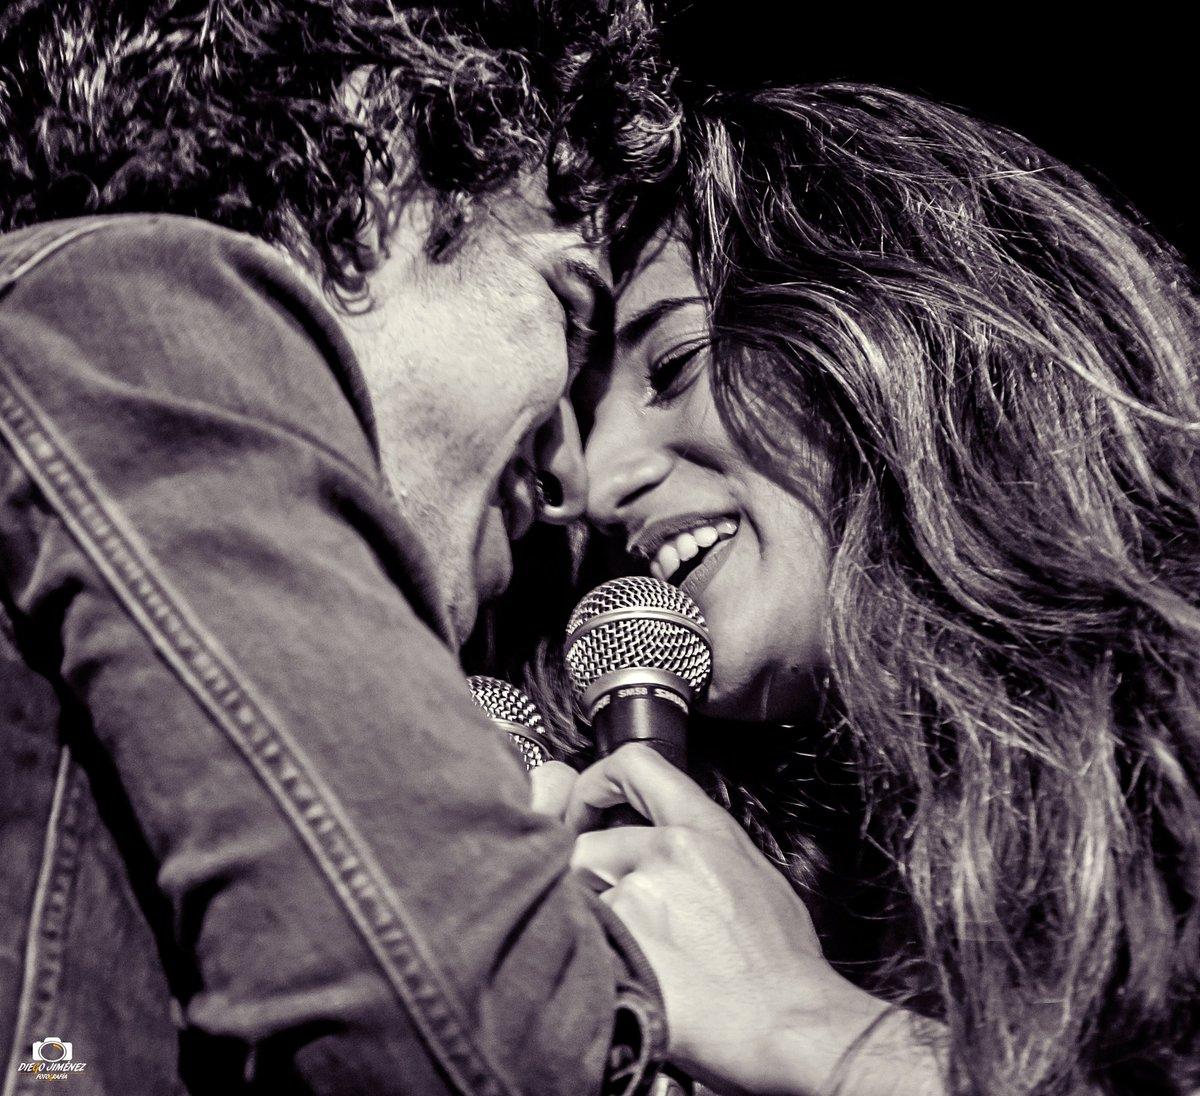 Momentazo sobre el escenario de la @salacustom @itsjuliamedina y @hermidagonzalo ...  #nodejodebailar #juliamedina #fotografomusical #fotosdeconcierto #fotosendirecto #photography #photographer #music #musica #concierto #singer #fotografo #diegojimenezfotografia #guitarra